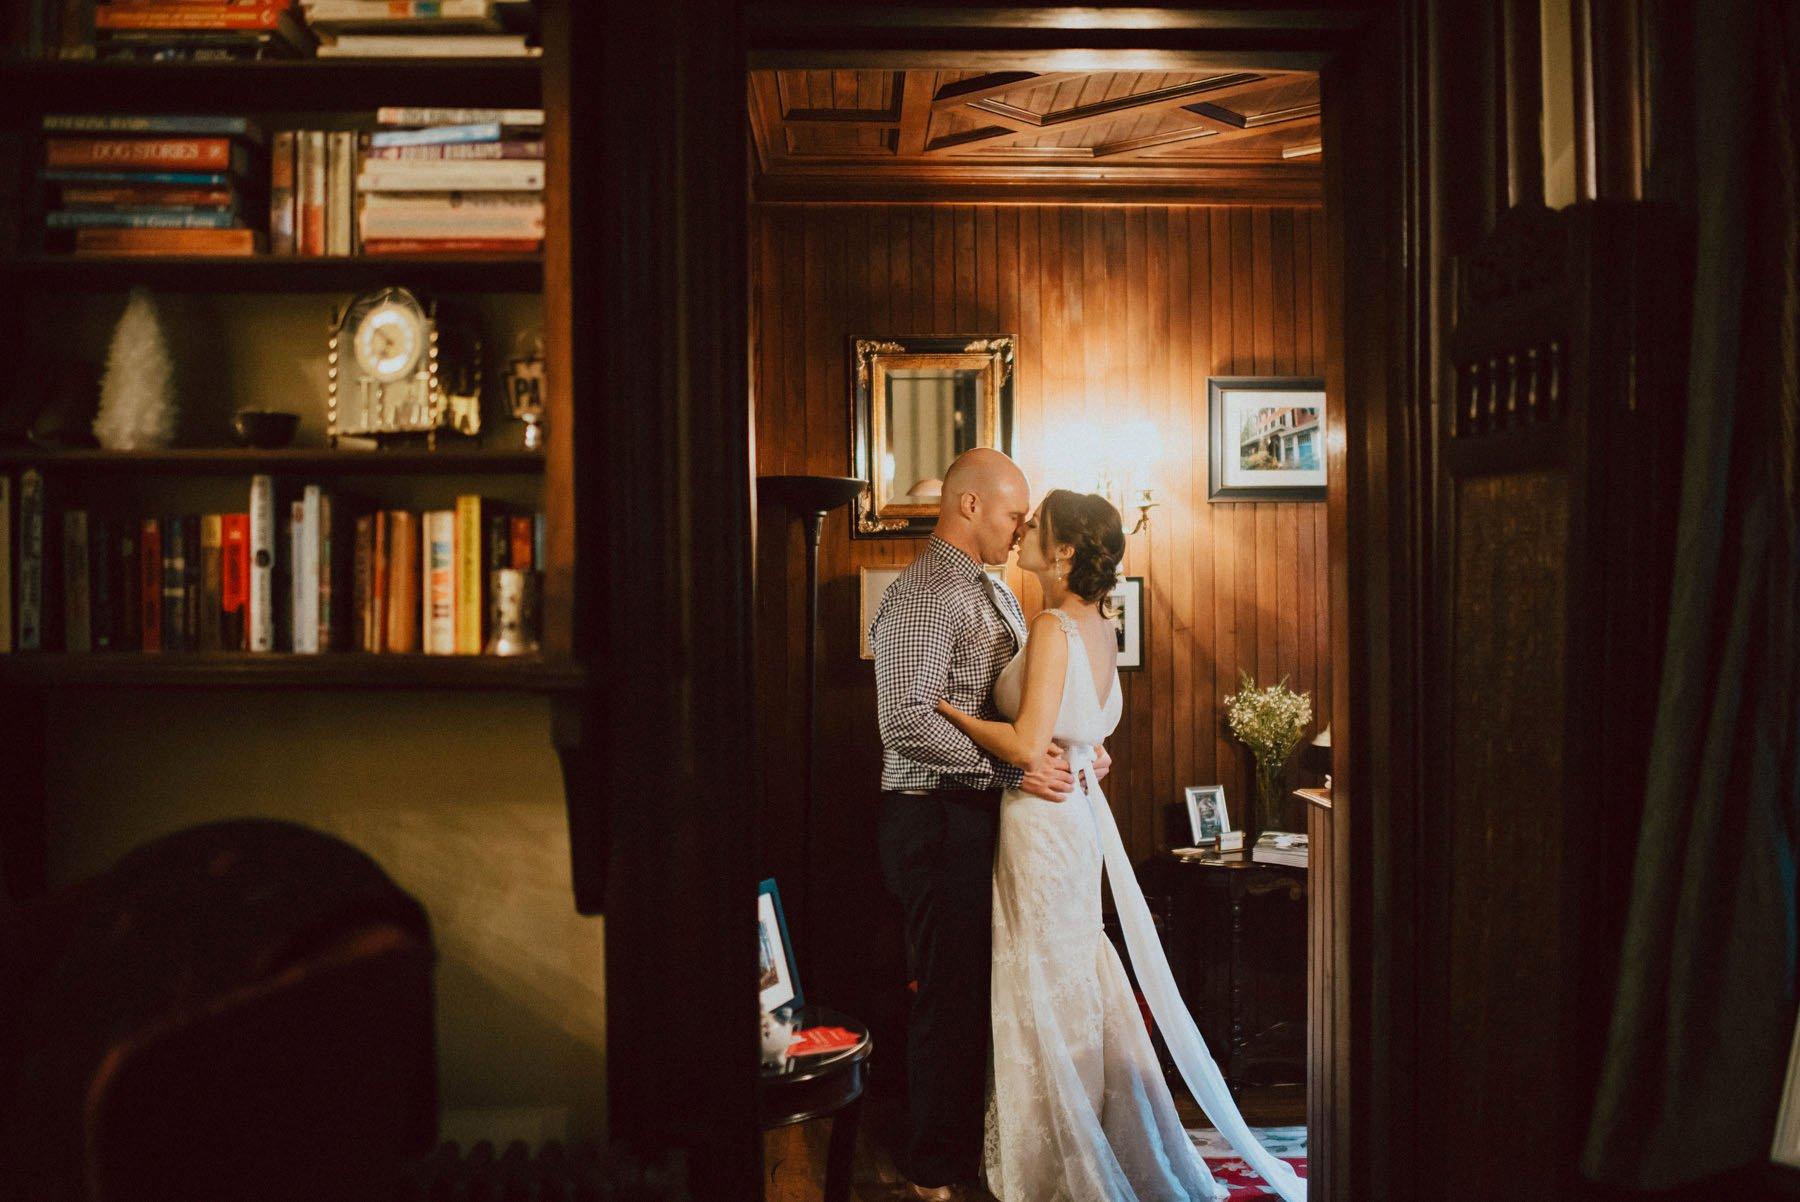 faunbrook-bed-and-breakfast-wedding-126.jpg